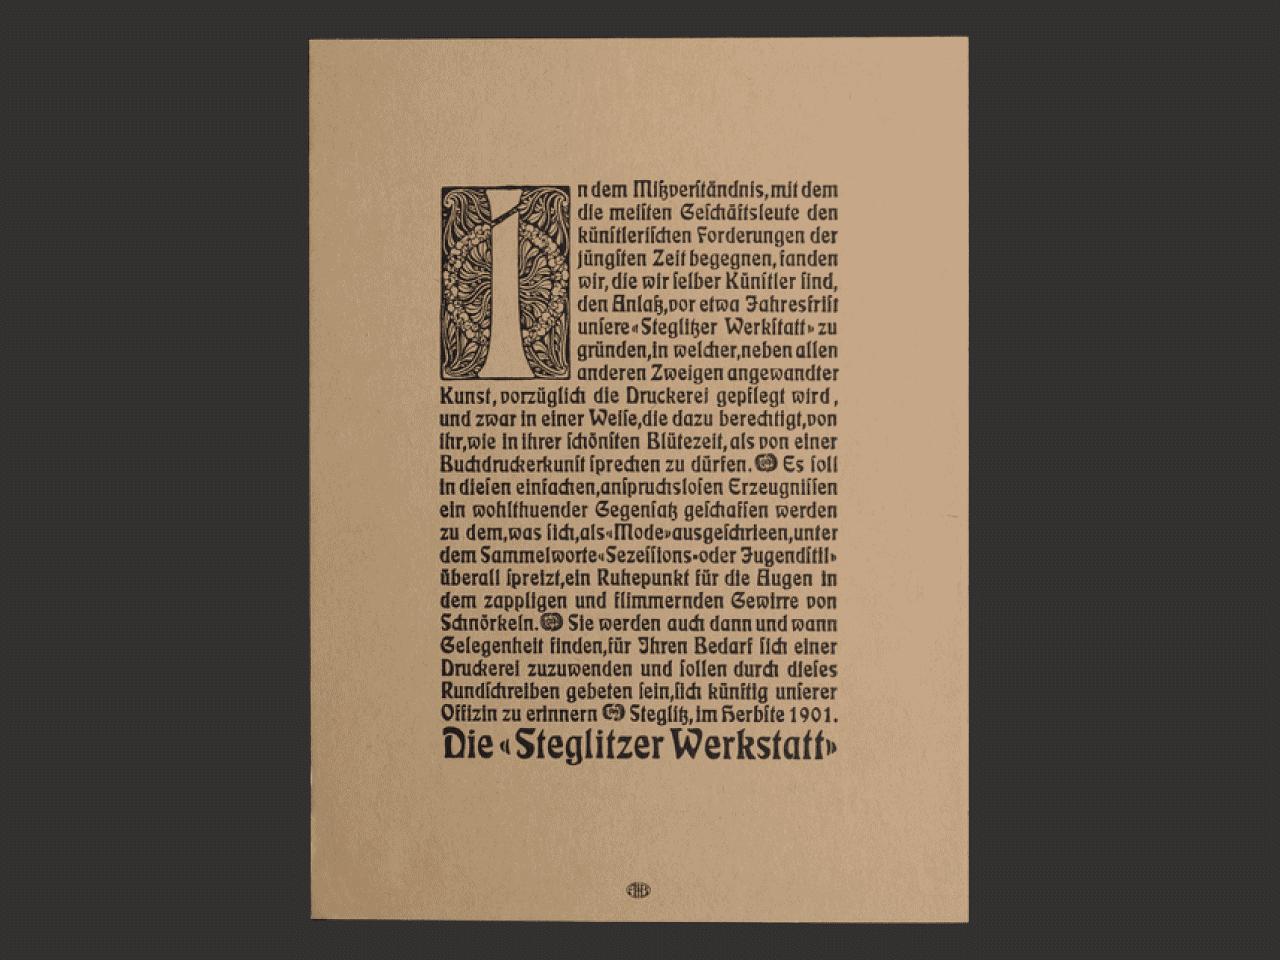 Steglitzer Werkstatt Manifesto